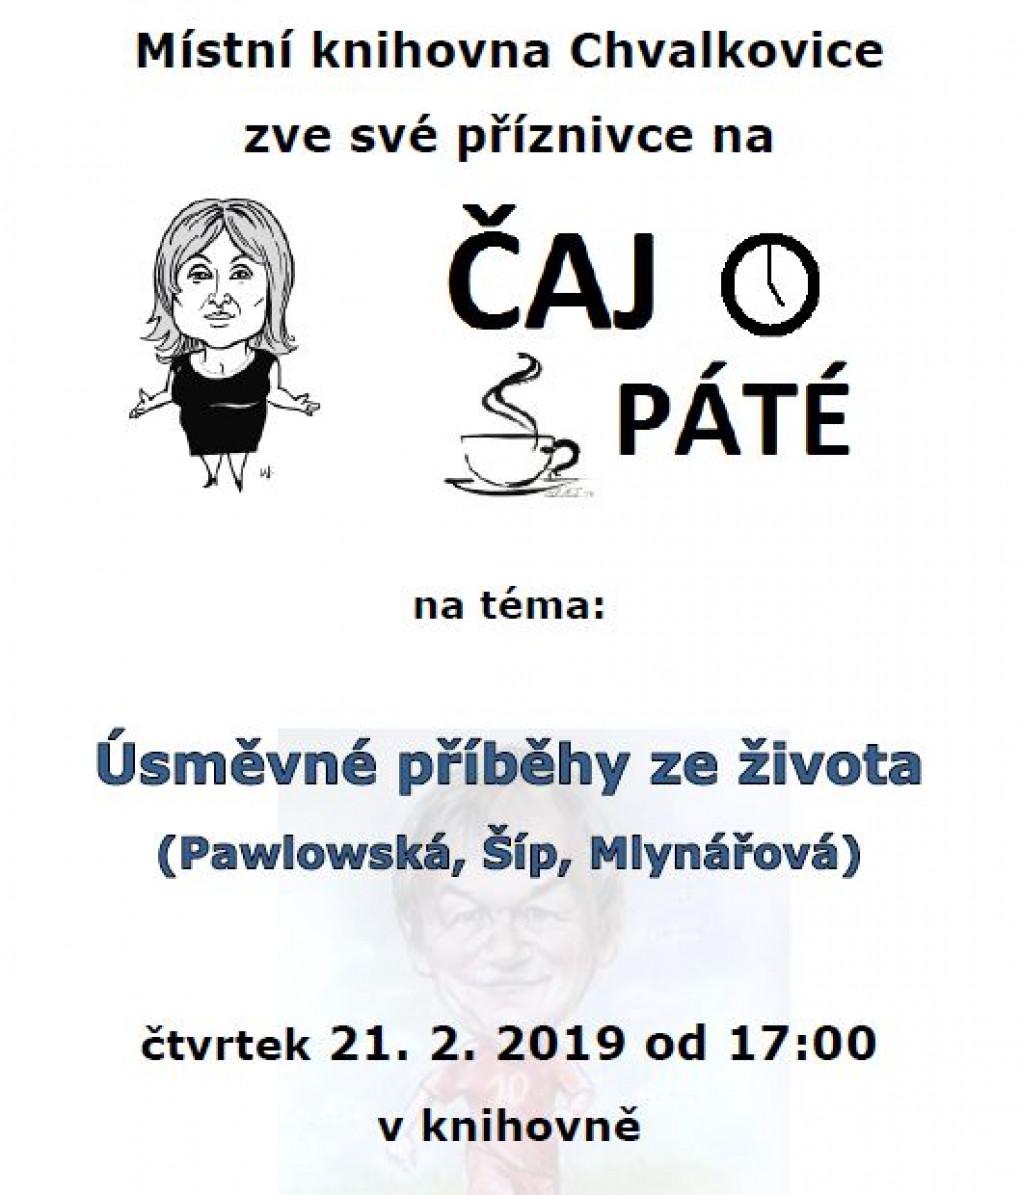 20190221_Caj_o_pate.jpg